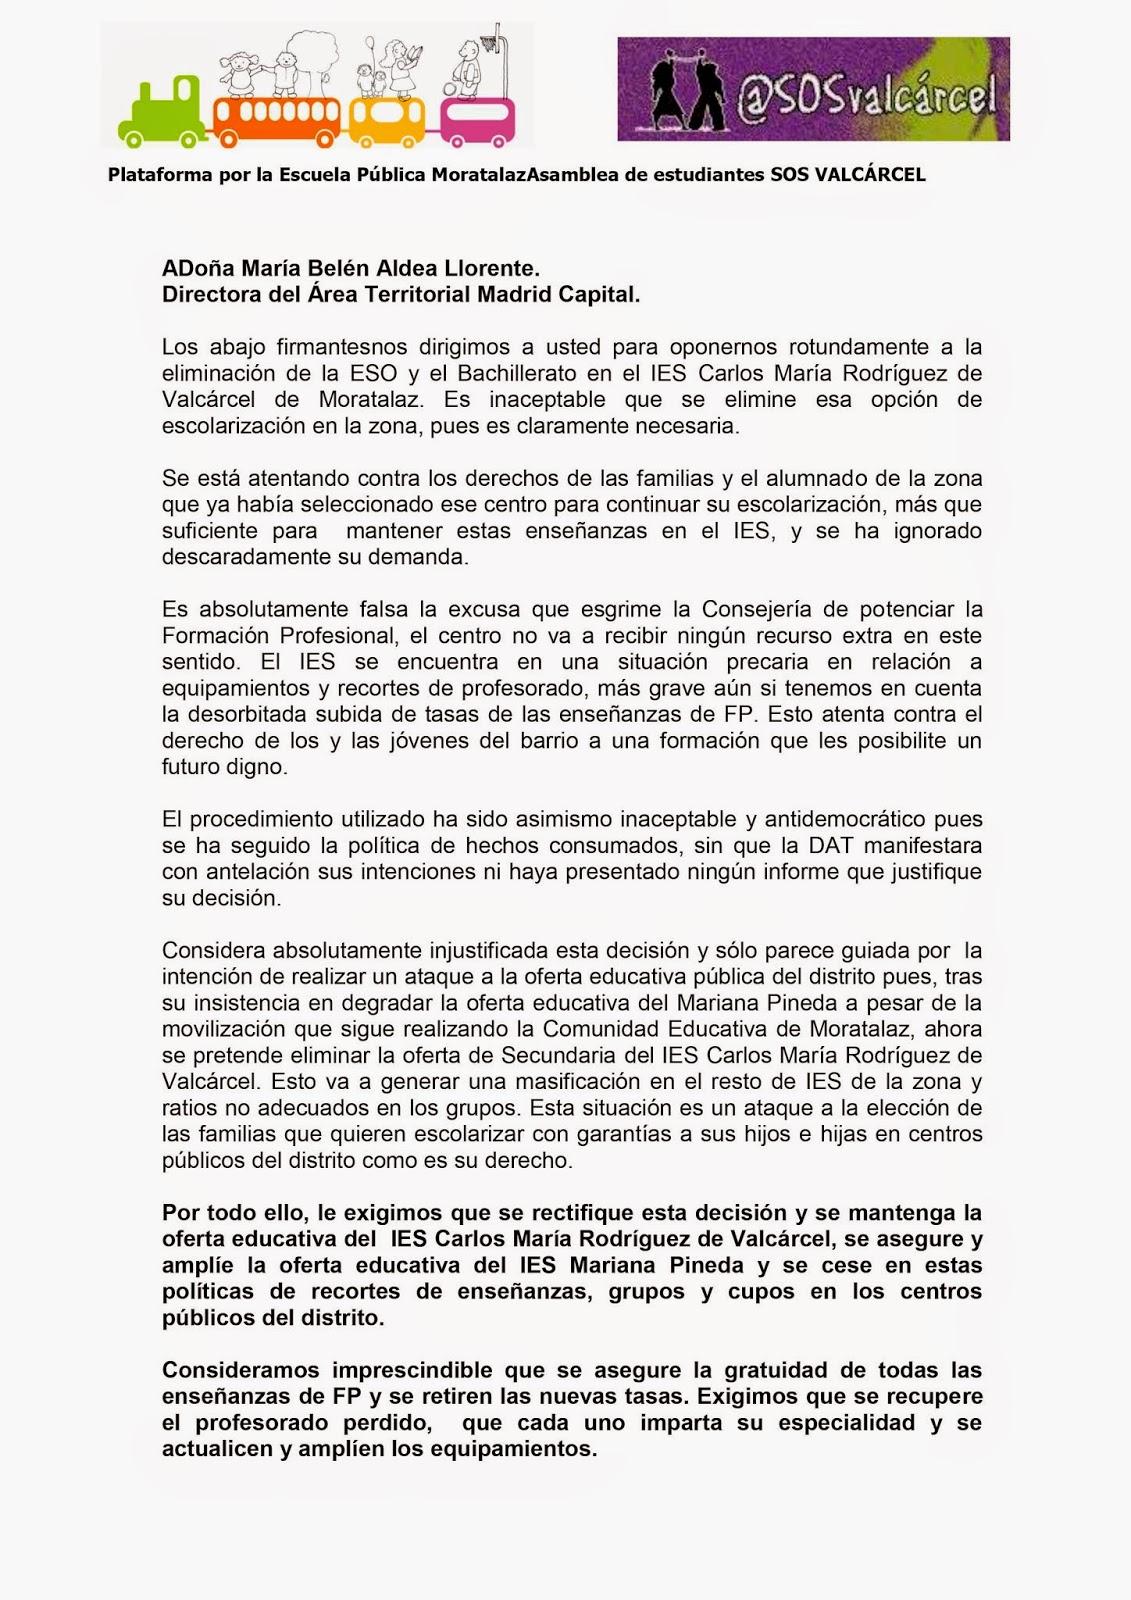 MareaVerde: Modelo de firmas de la Plataforma por la Escuela ...